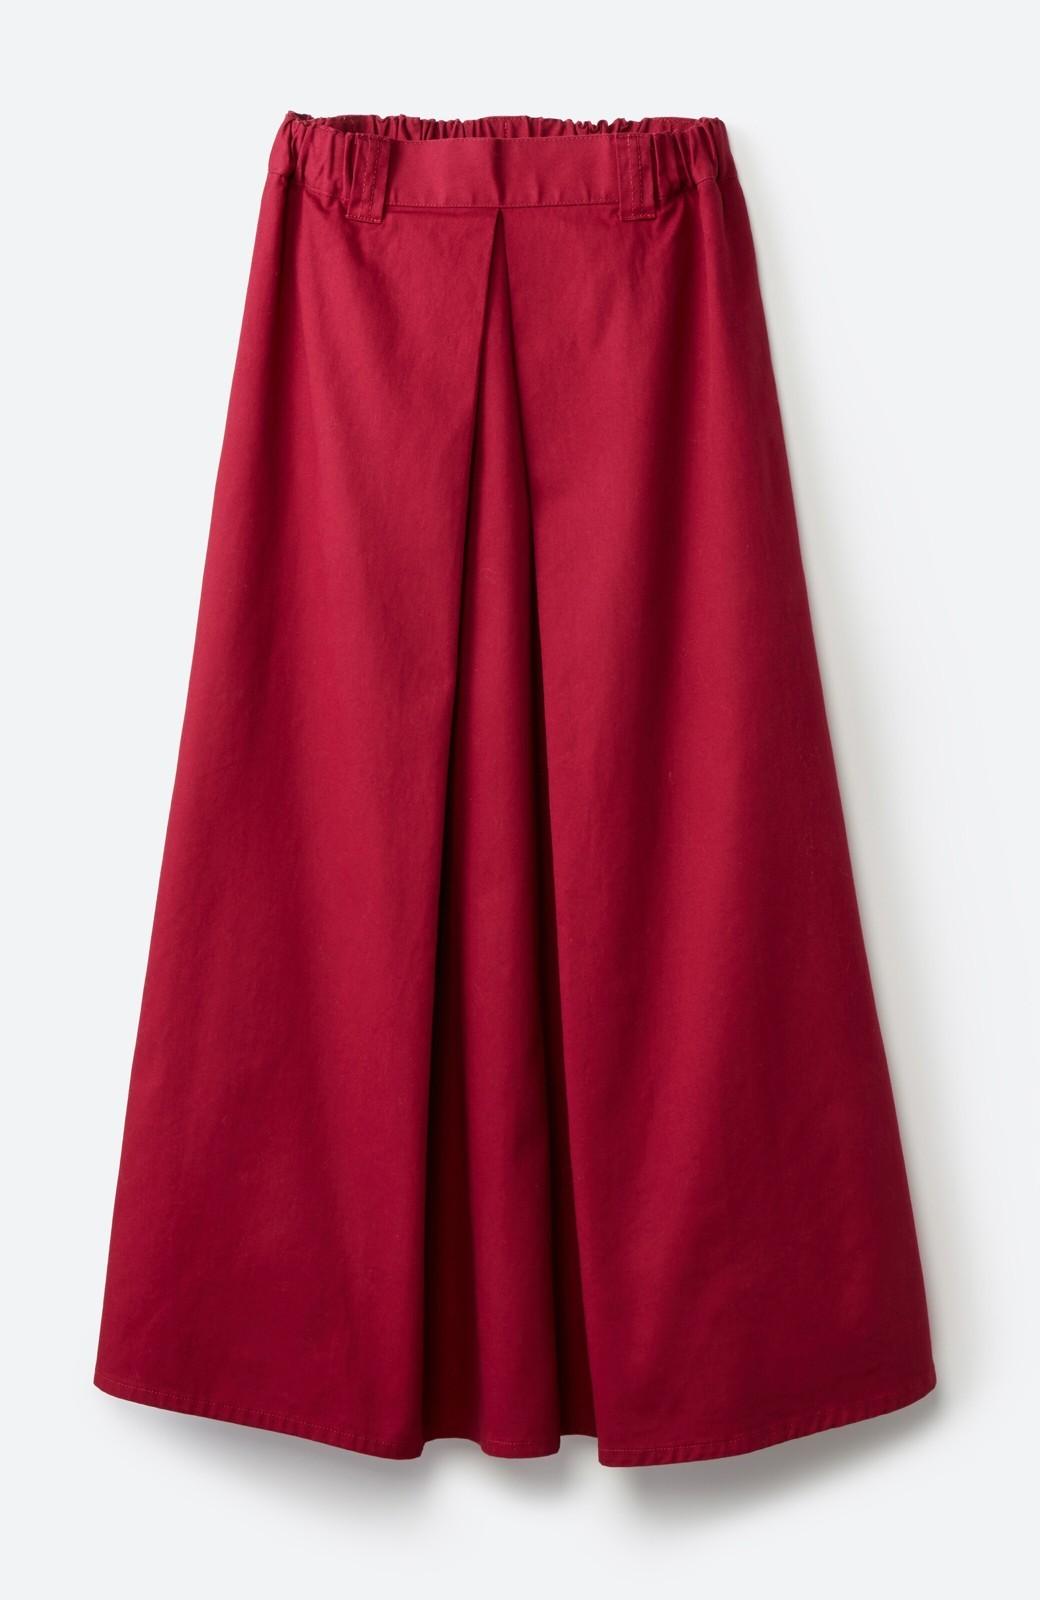 haco! ロングシーズン楽しめる タックボリュームのチノロングスカート <パープル>の商品写真2